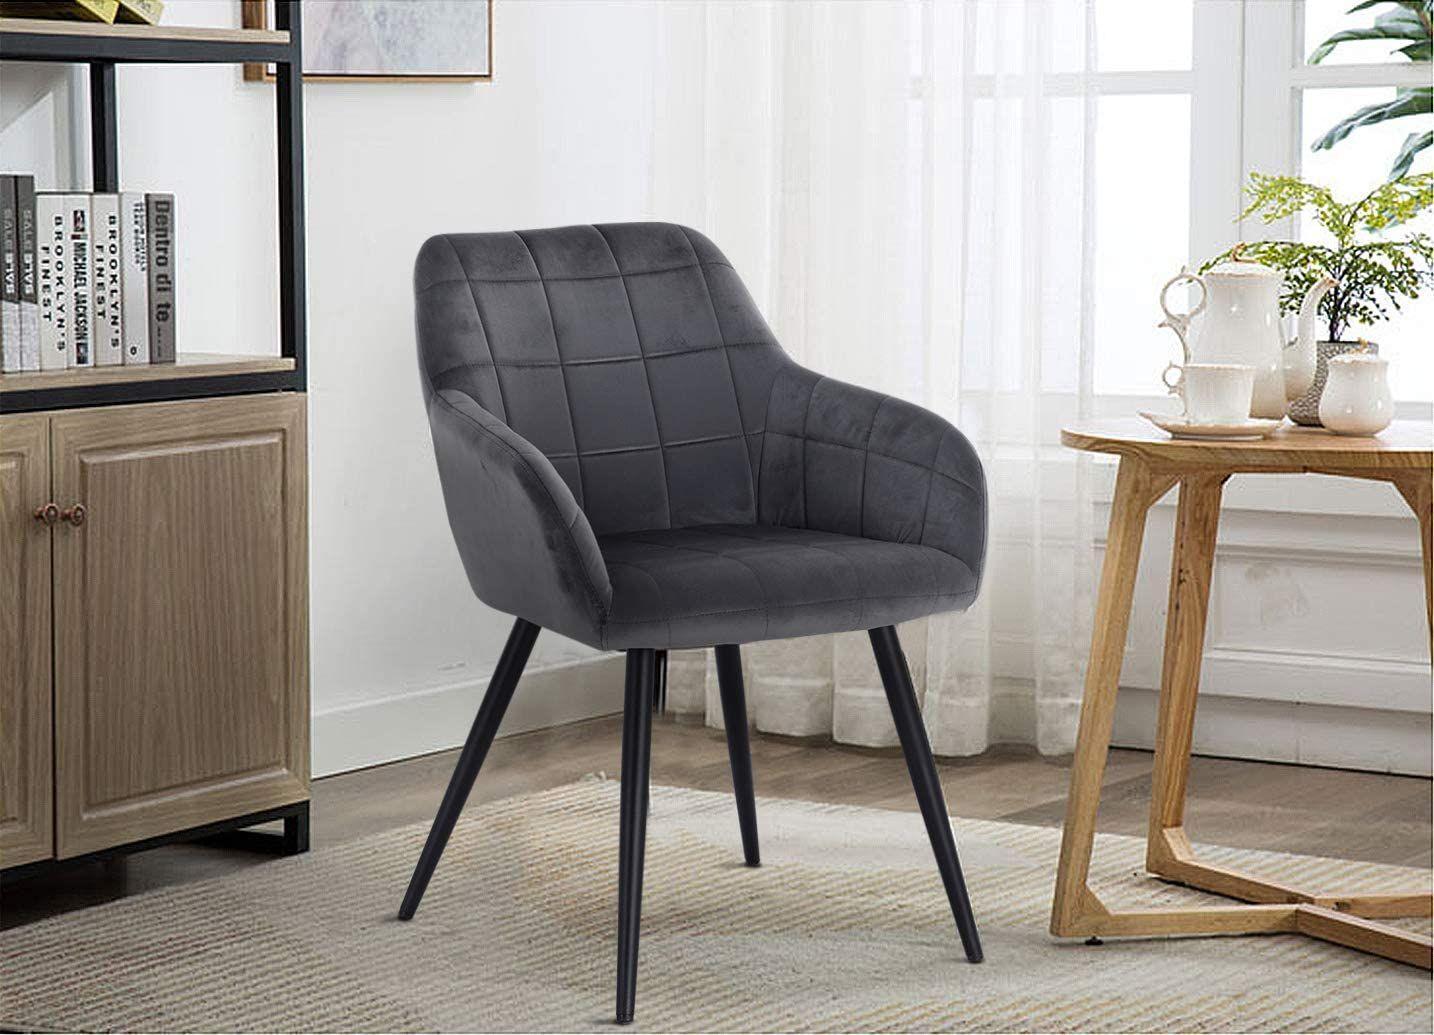 Höhe Sitzfläche Stuhl